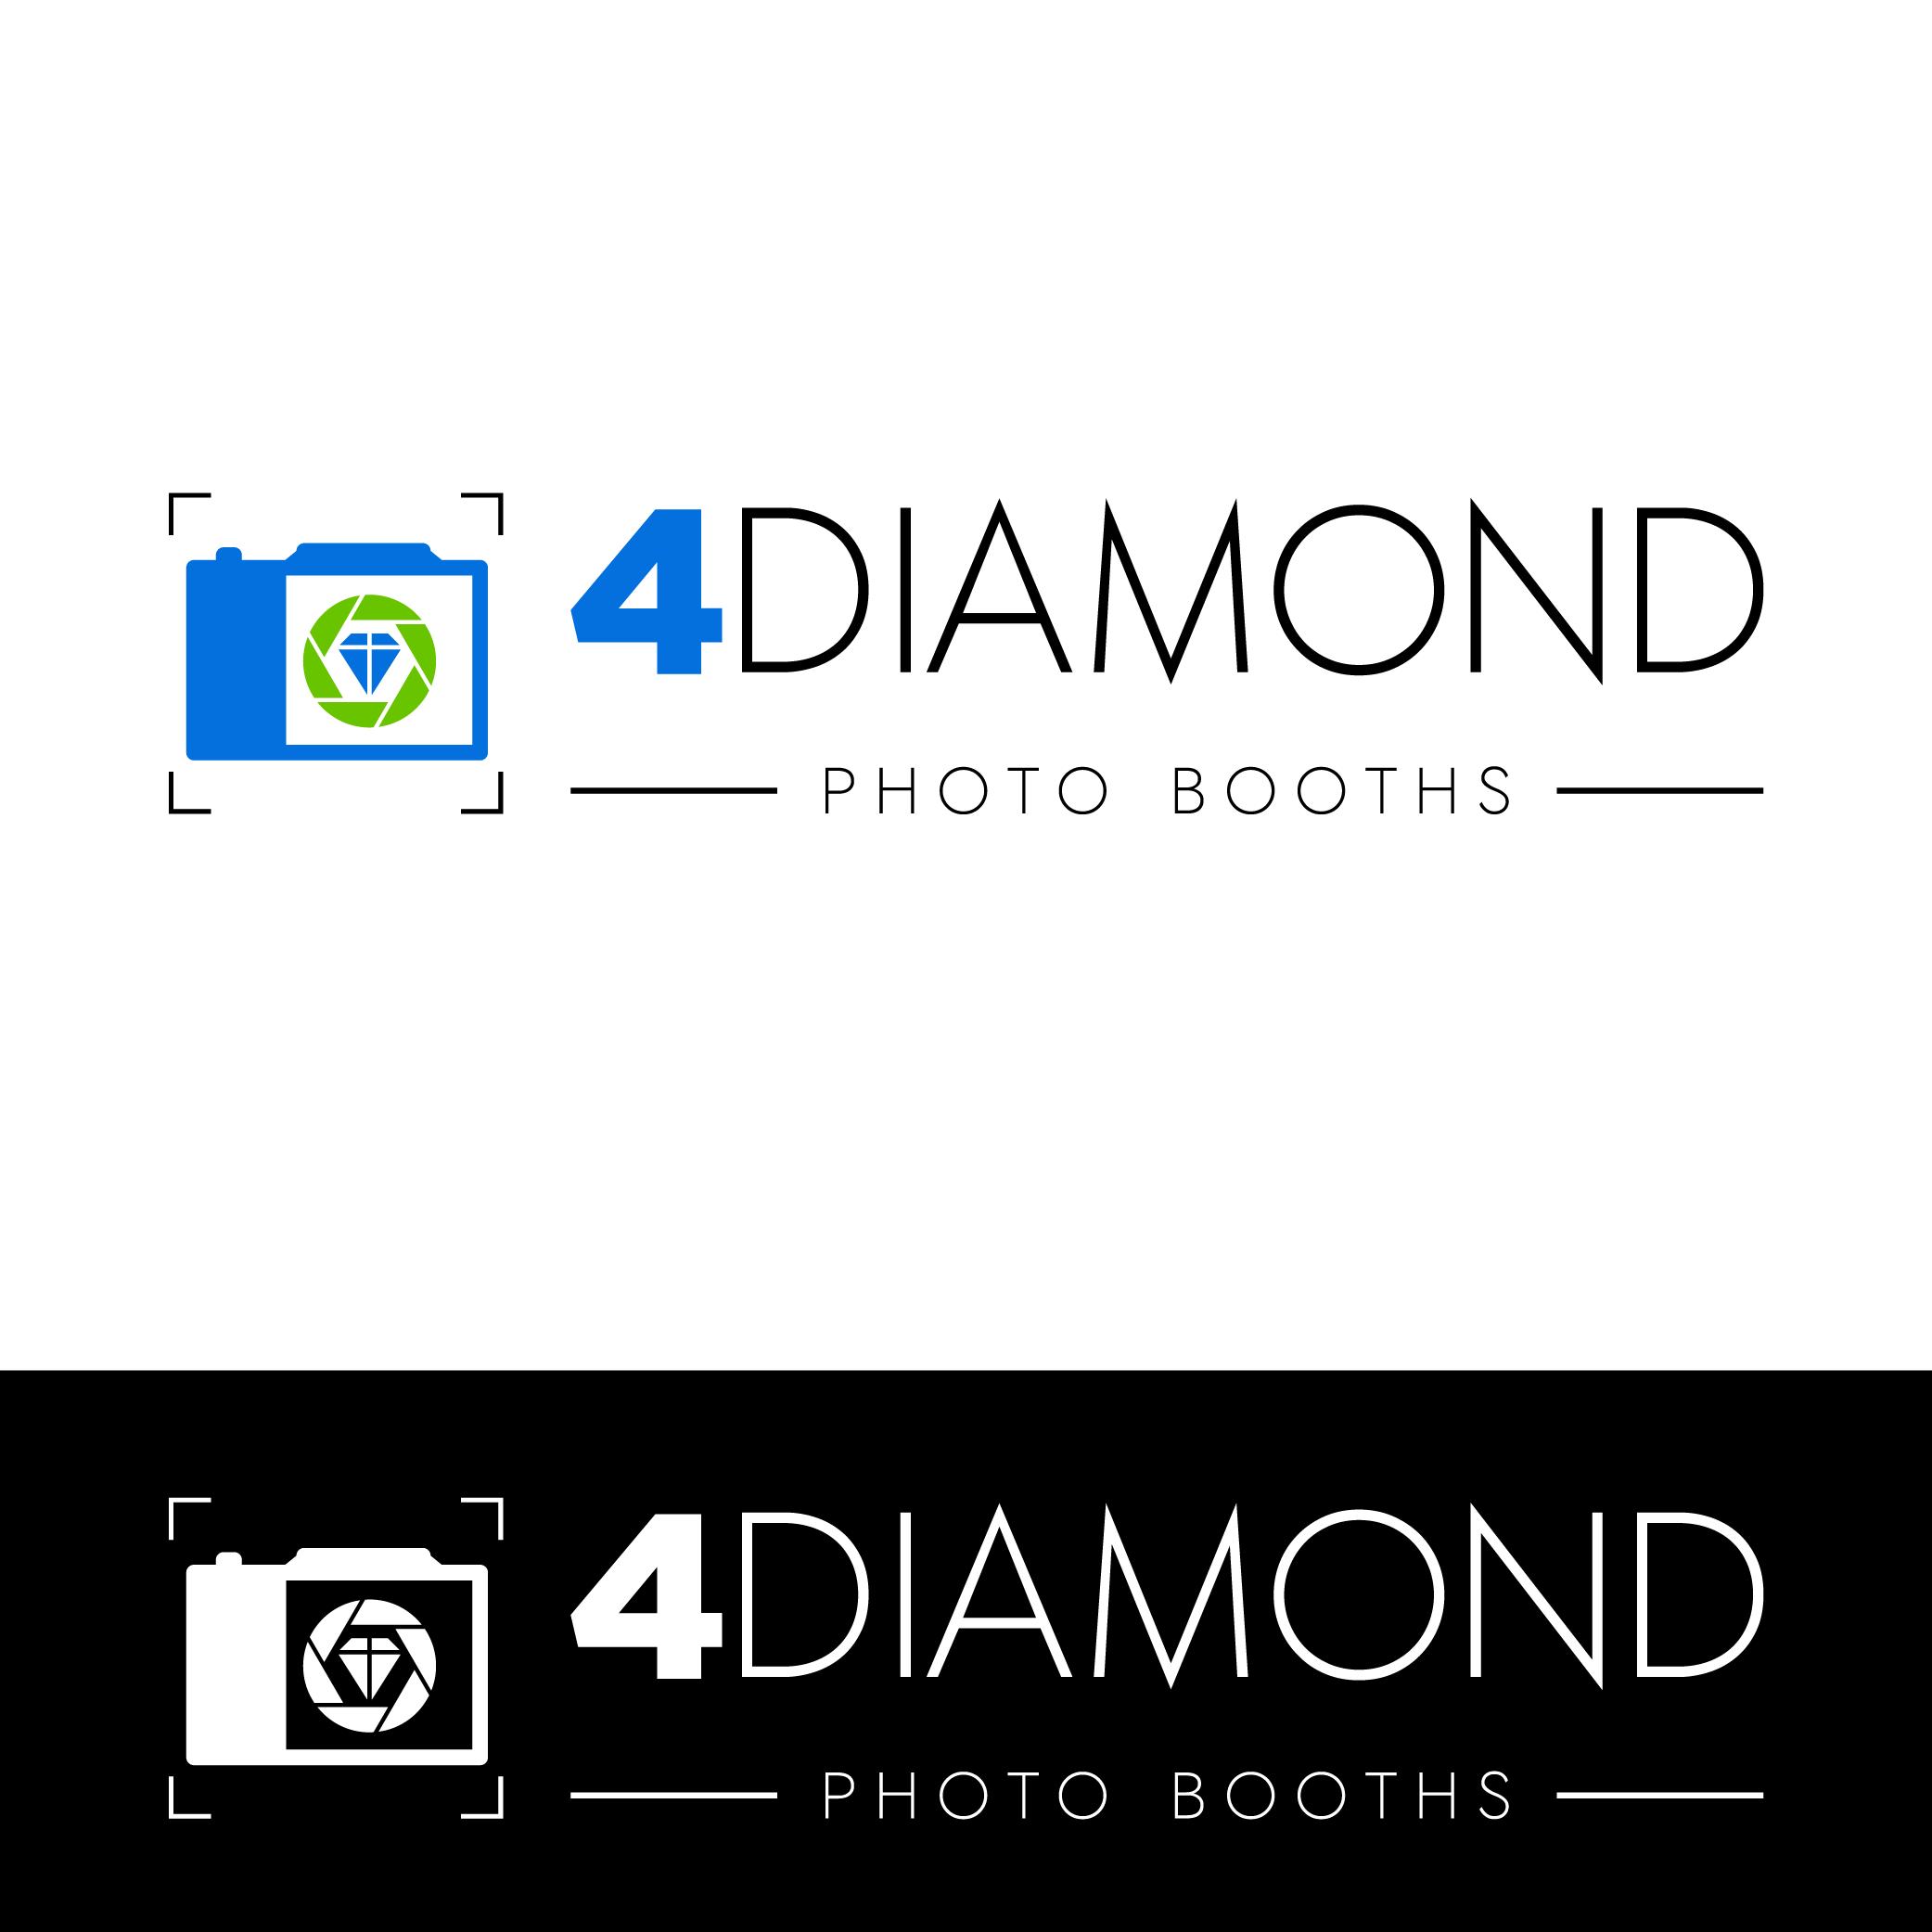 Logo Design by Private User - Entry No. 7 in the Logo Design Contest Creative Logo Design for 4 Diamond Photo Booths.